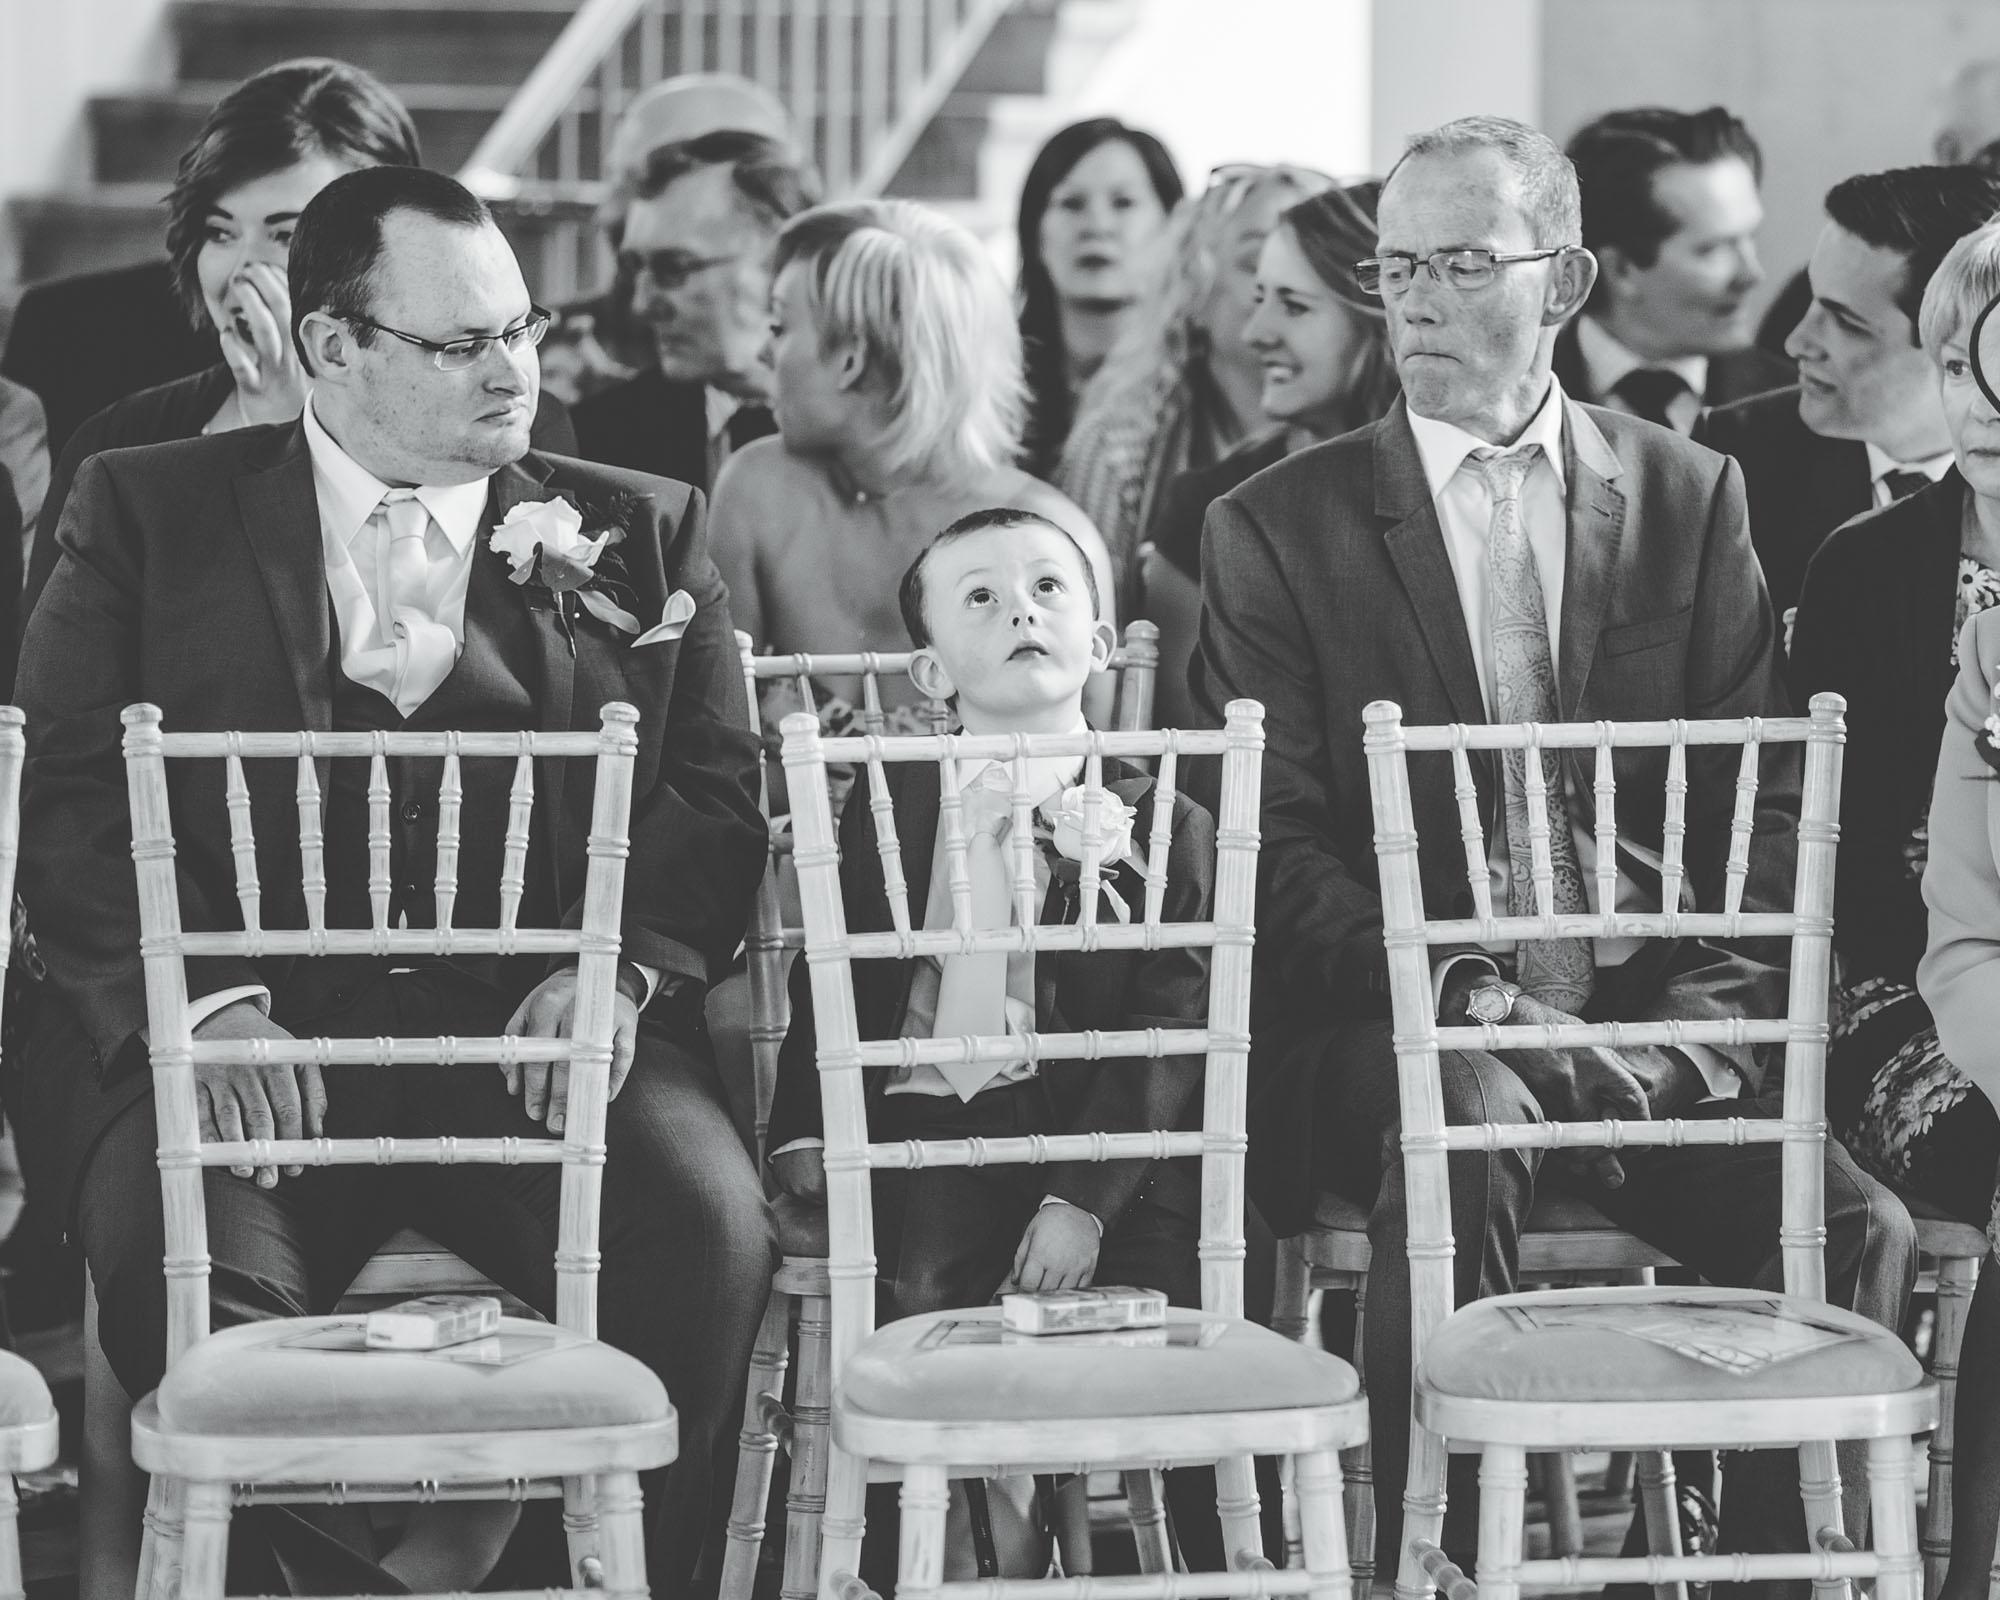 weddings can be boring